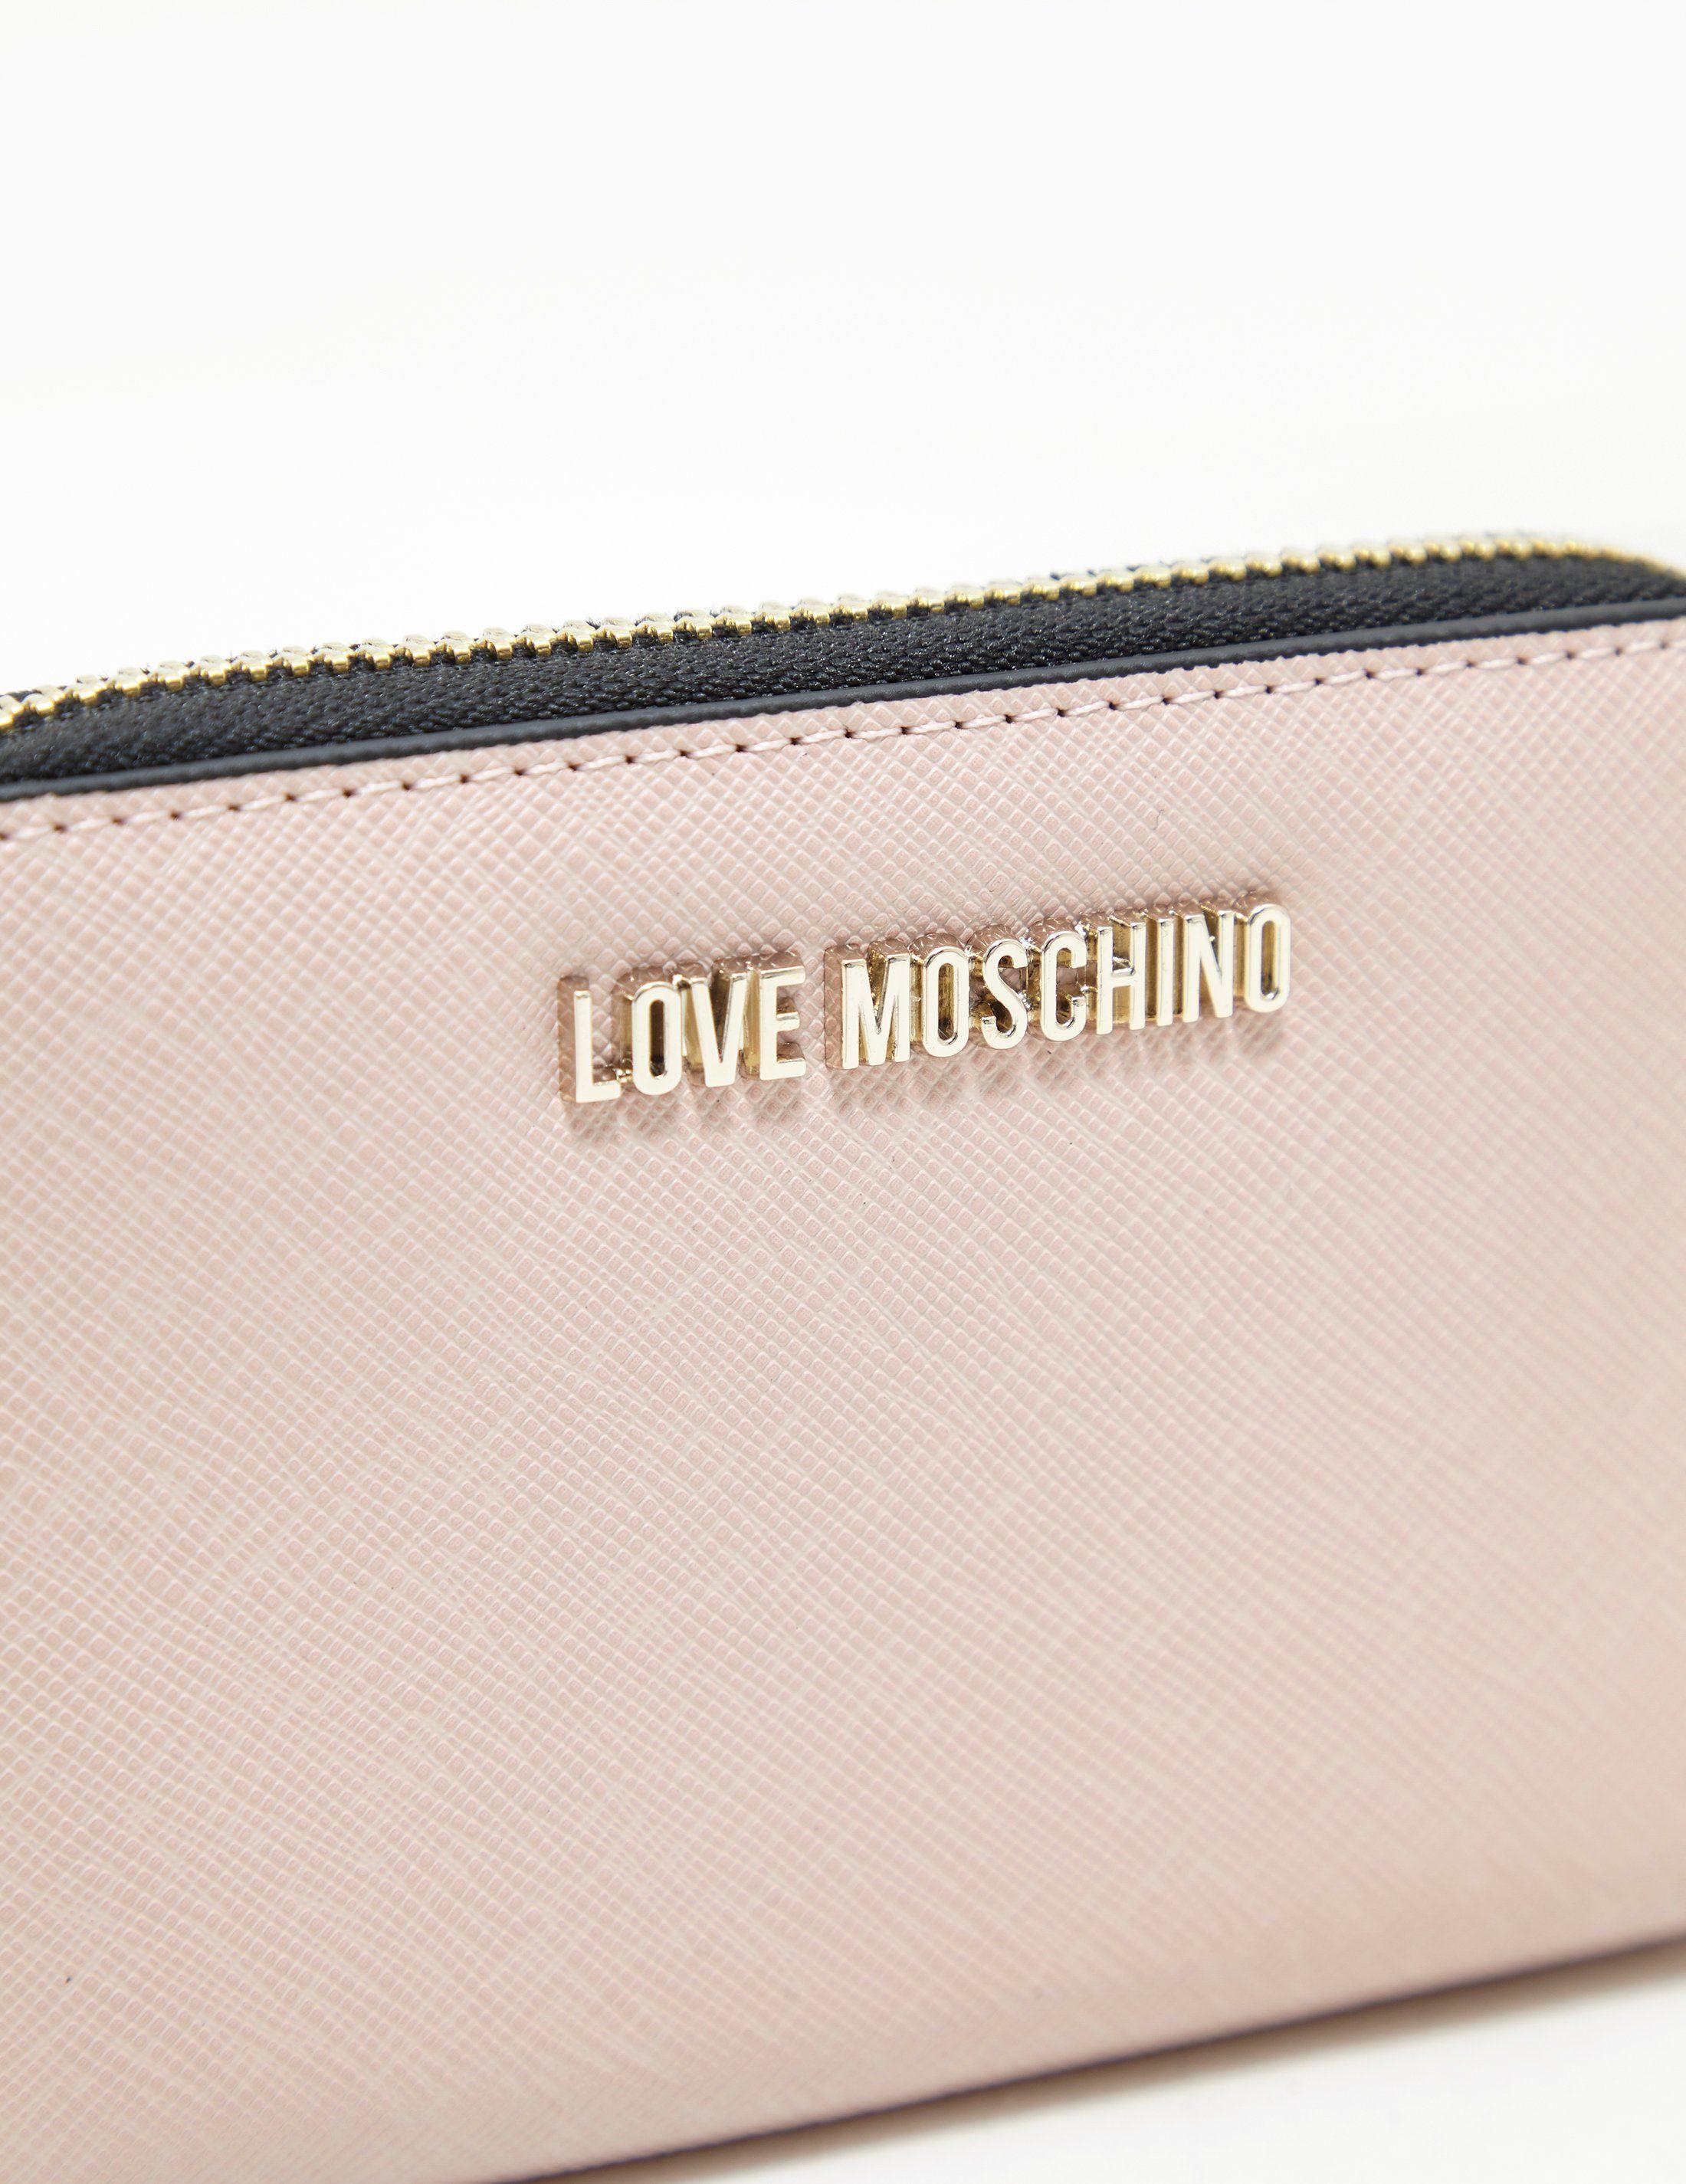 Love Moschino Small Zip Purse